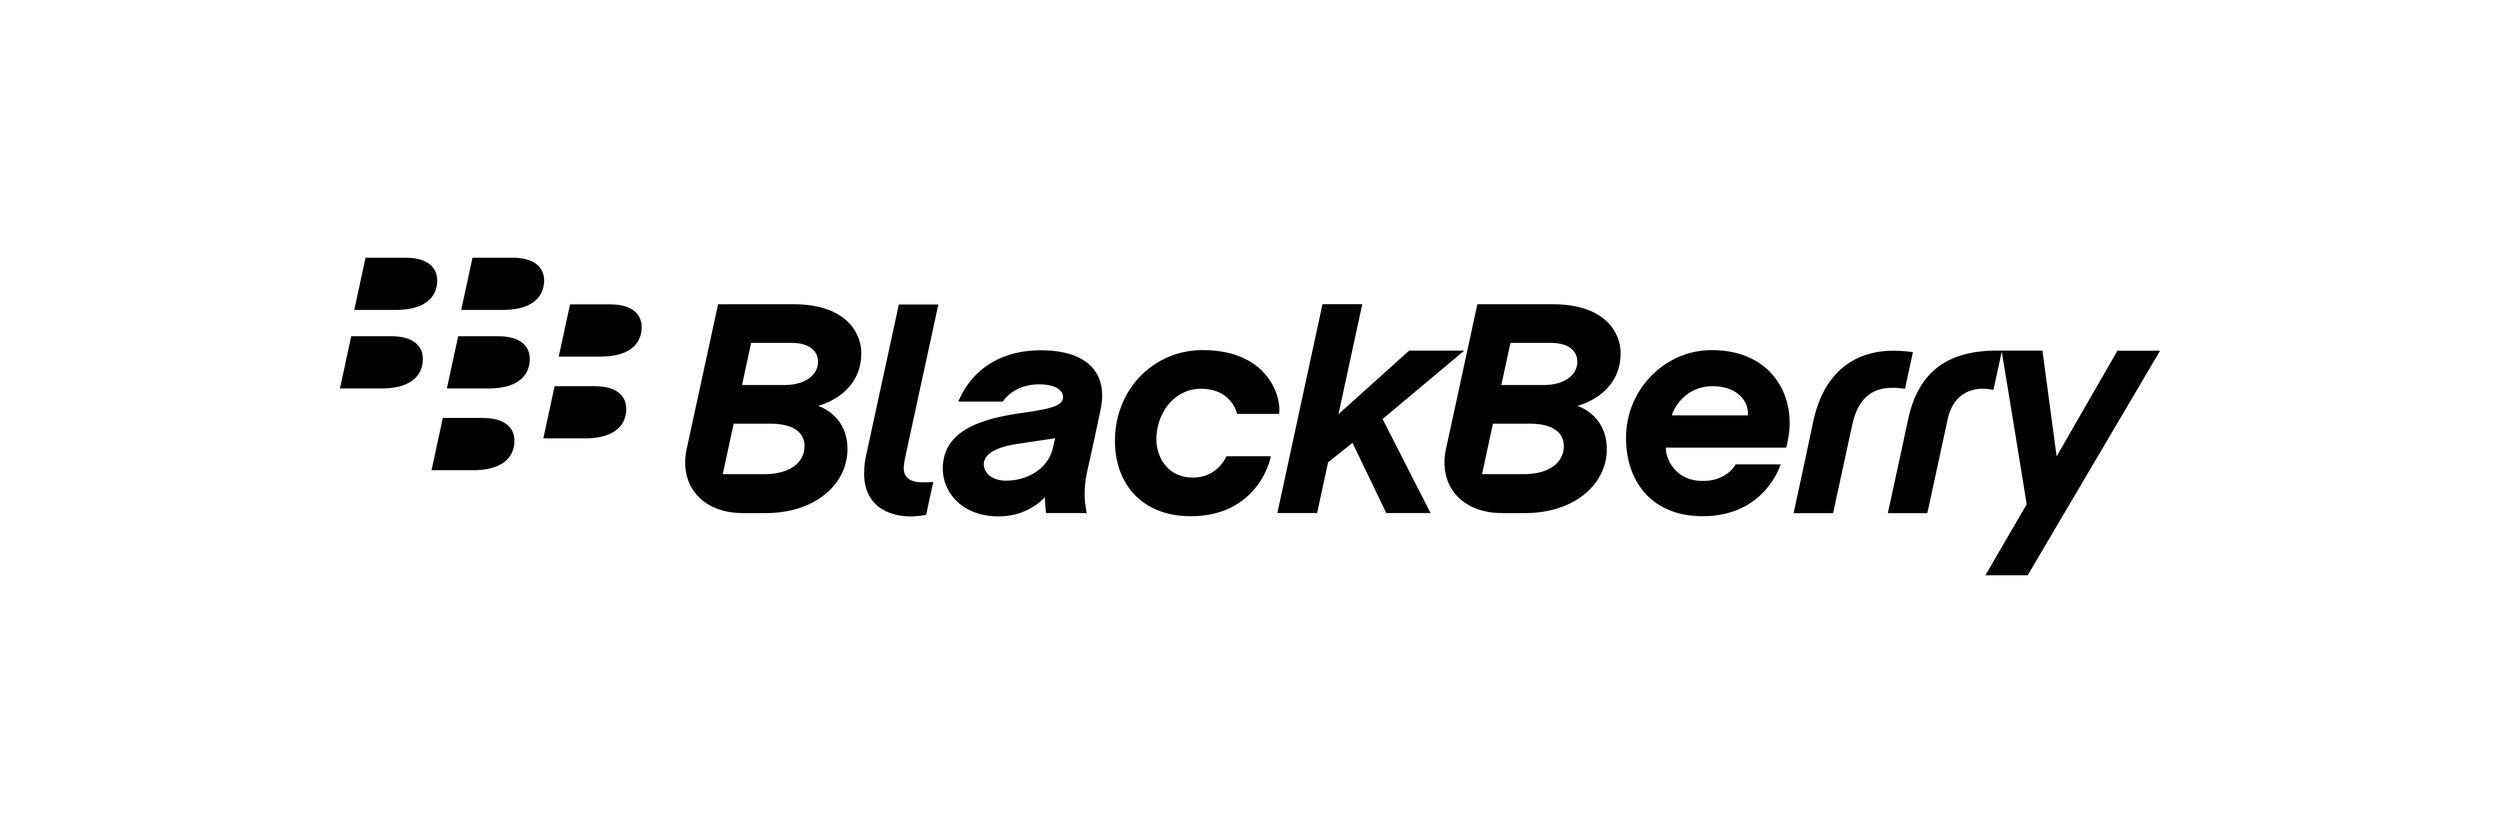 BlackBerry in RGB Black .jpg